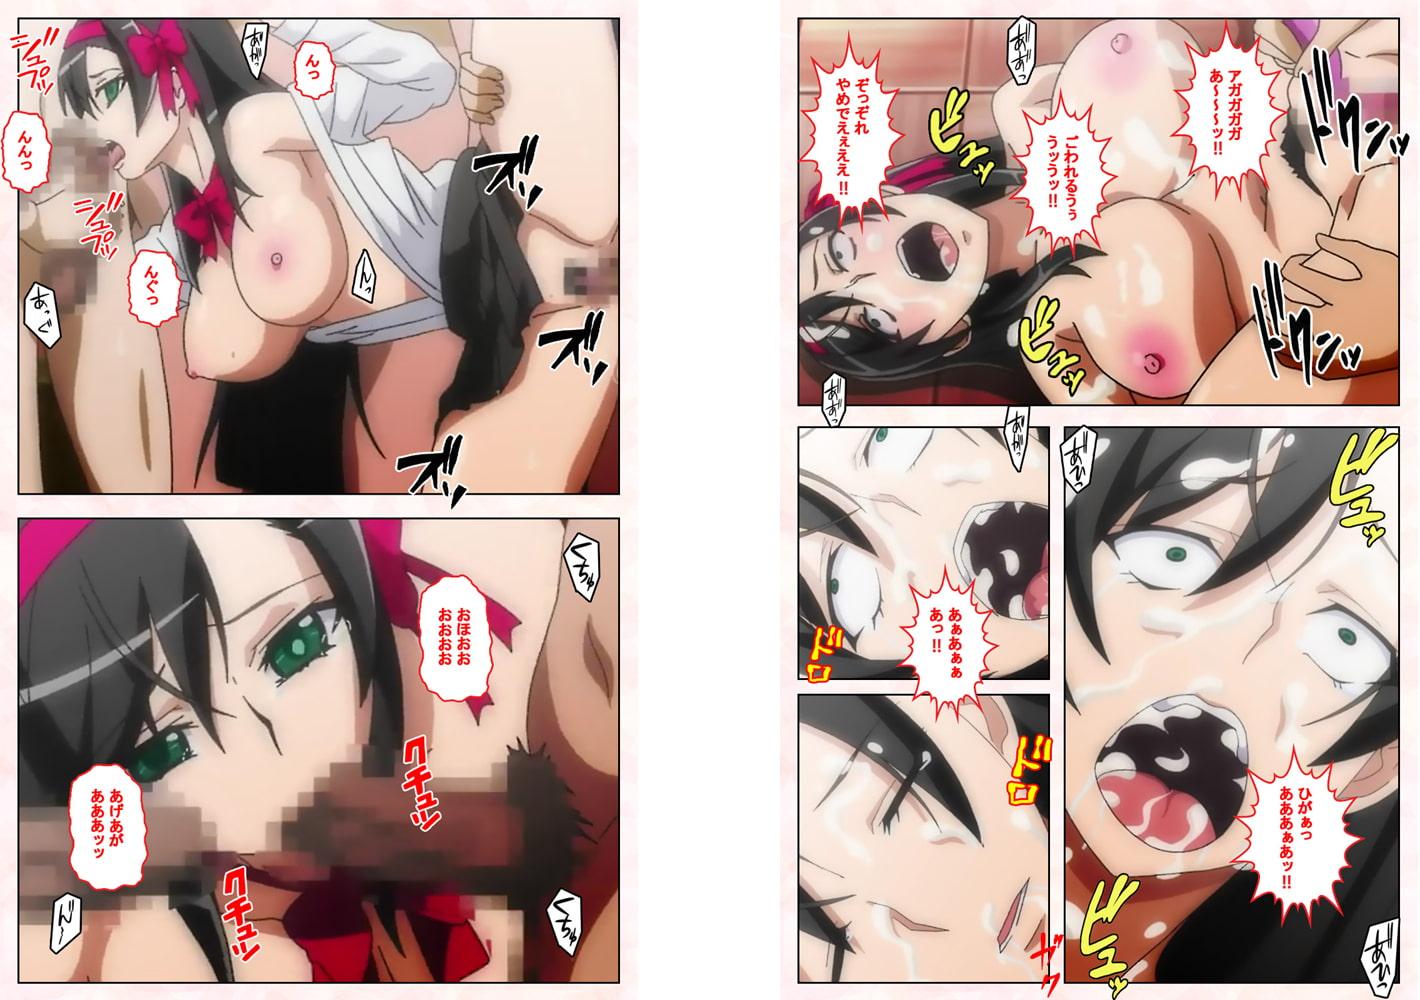 【フルカラー成人版】輪姦媚薬中毒-後編-Complete版